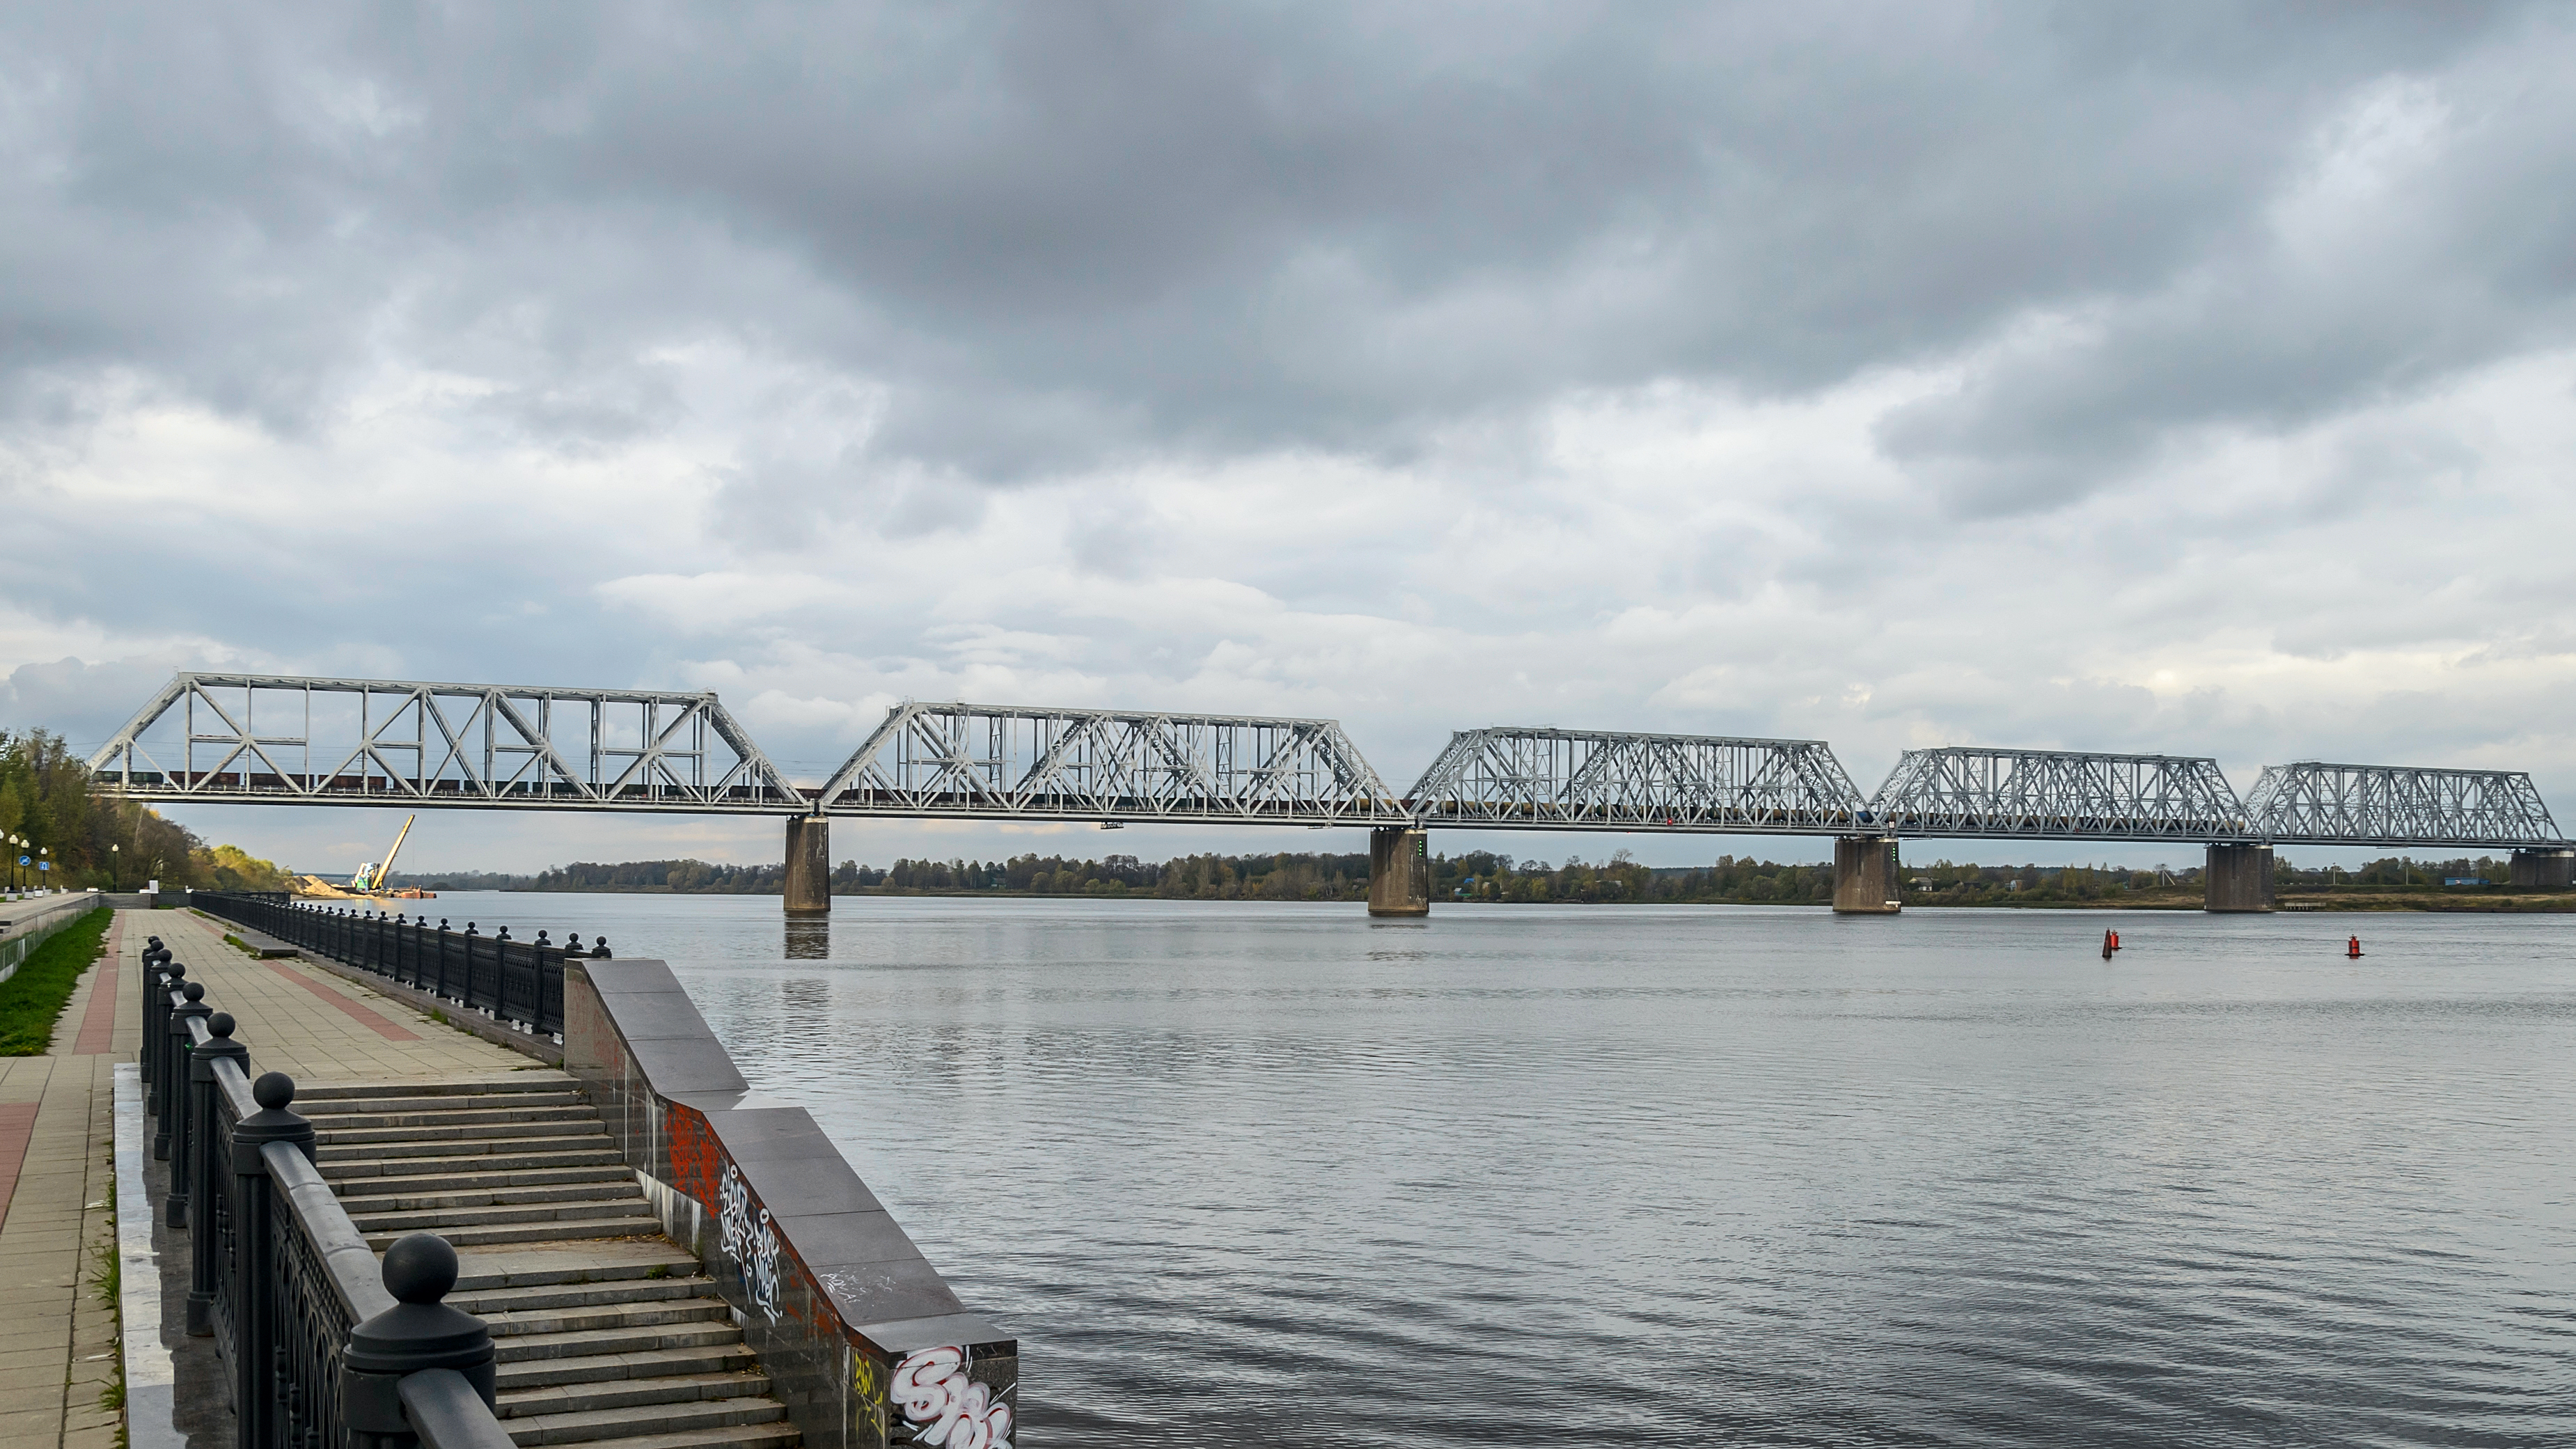 Висячий мост в ярославле фото 703-600